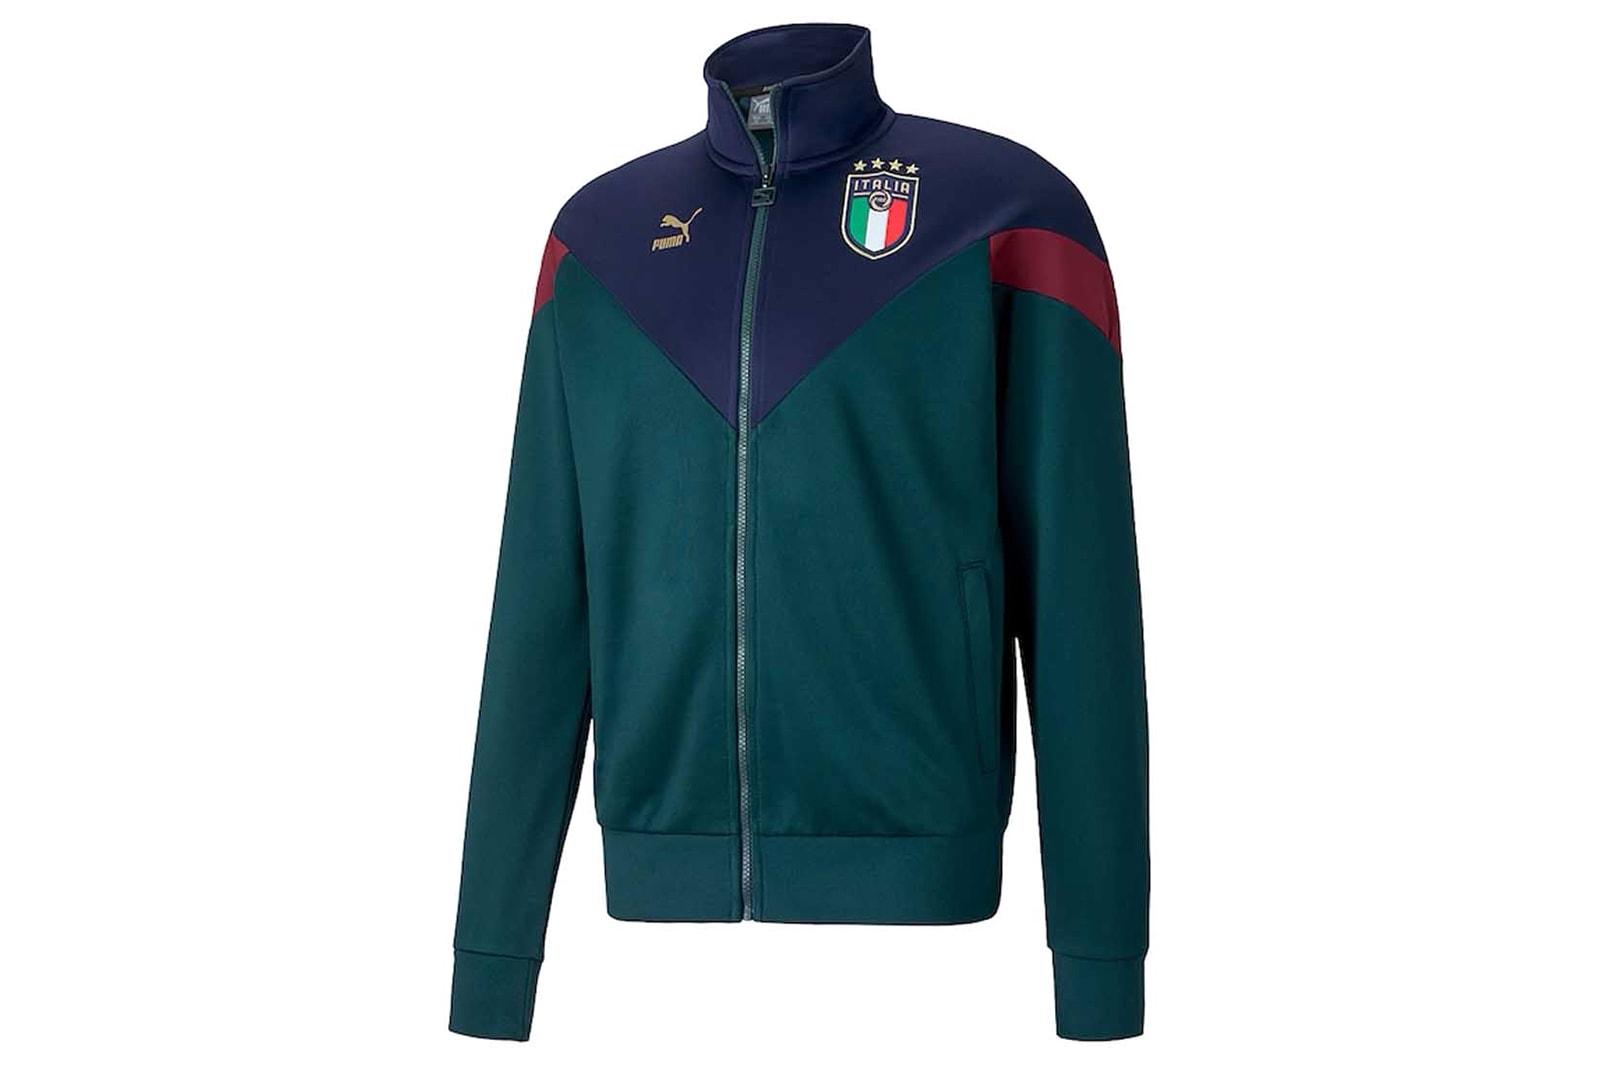 PUMA's Italy Renaissance Kit Clothing Collection Italian national football team green Azzurri football soccer